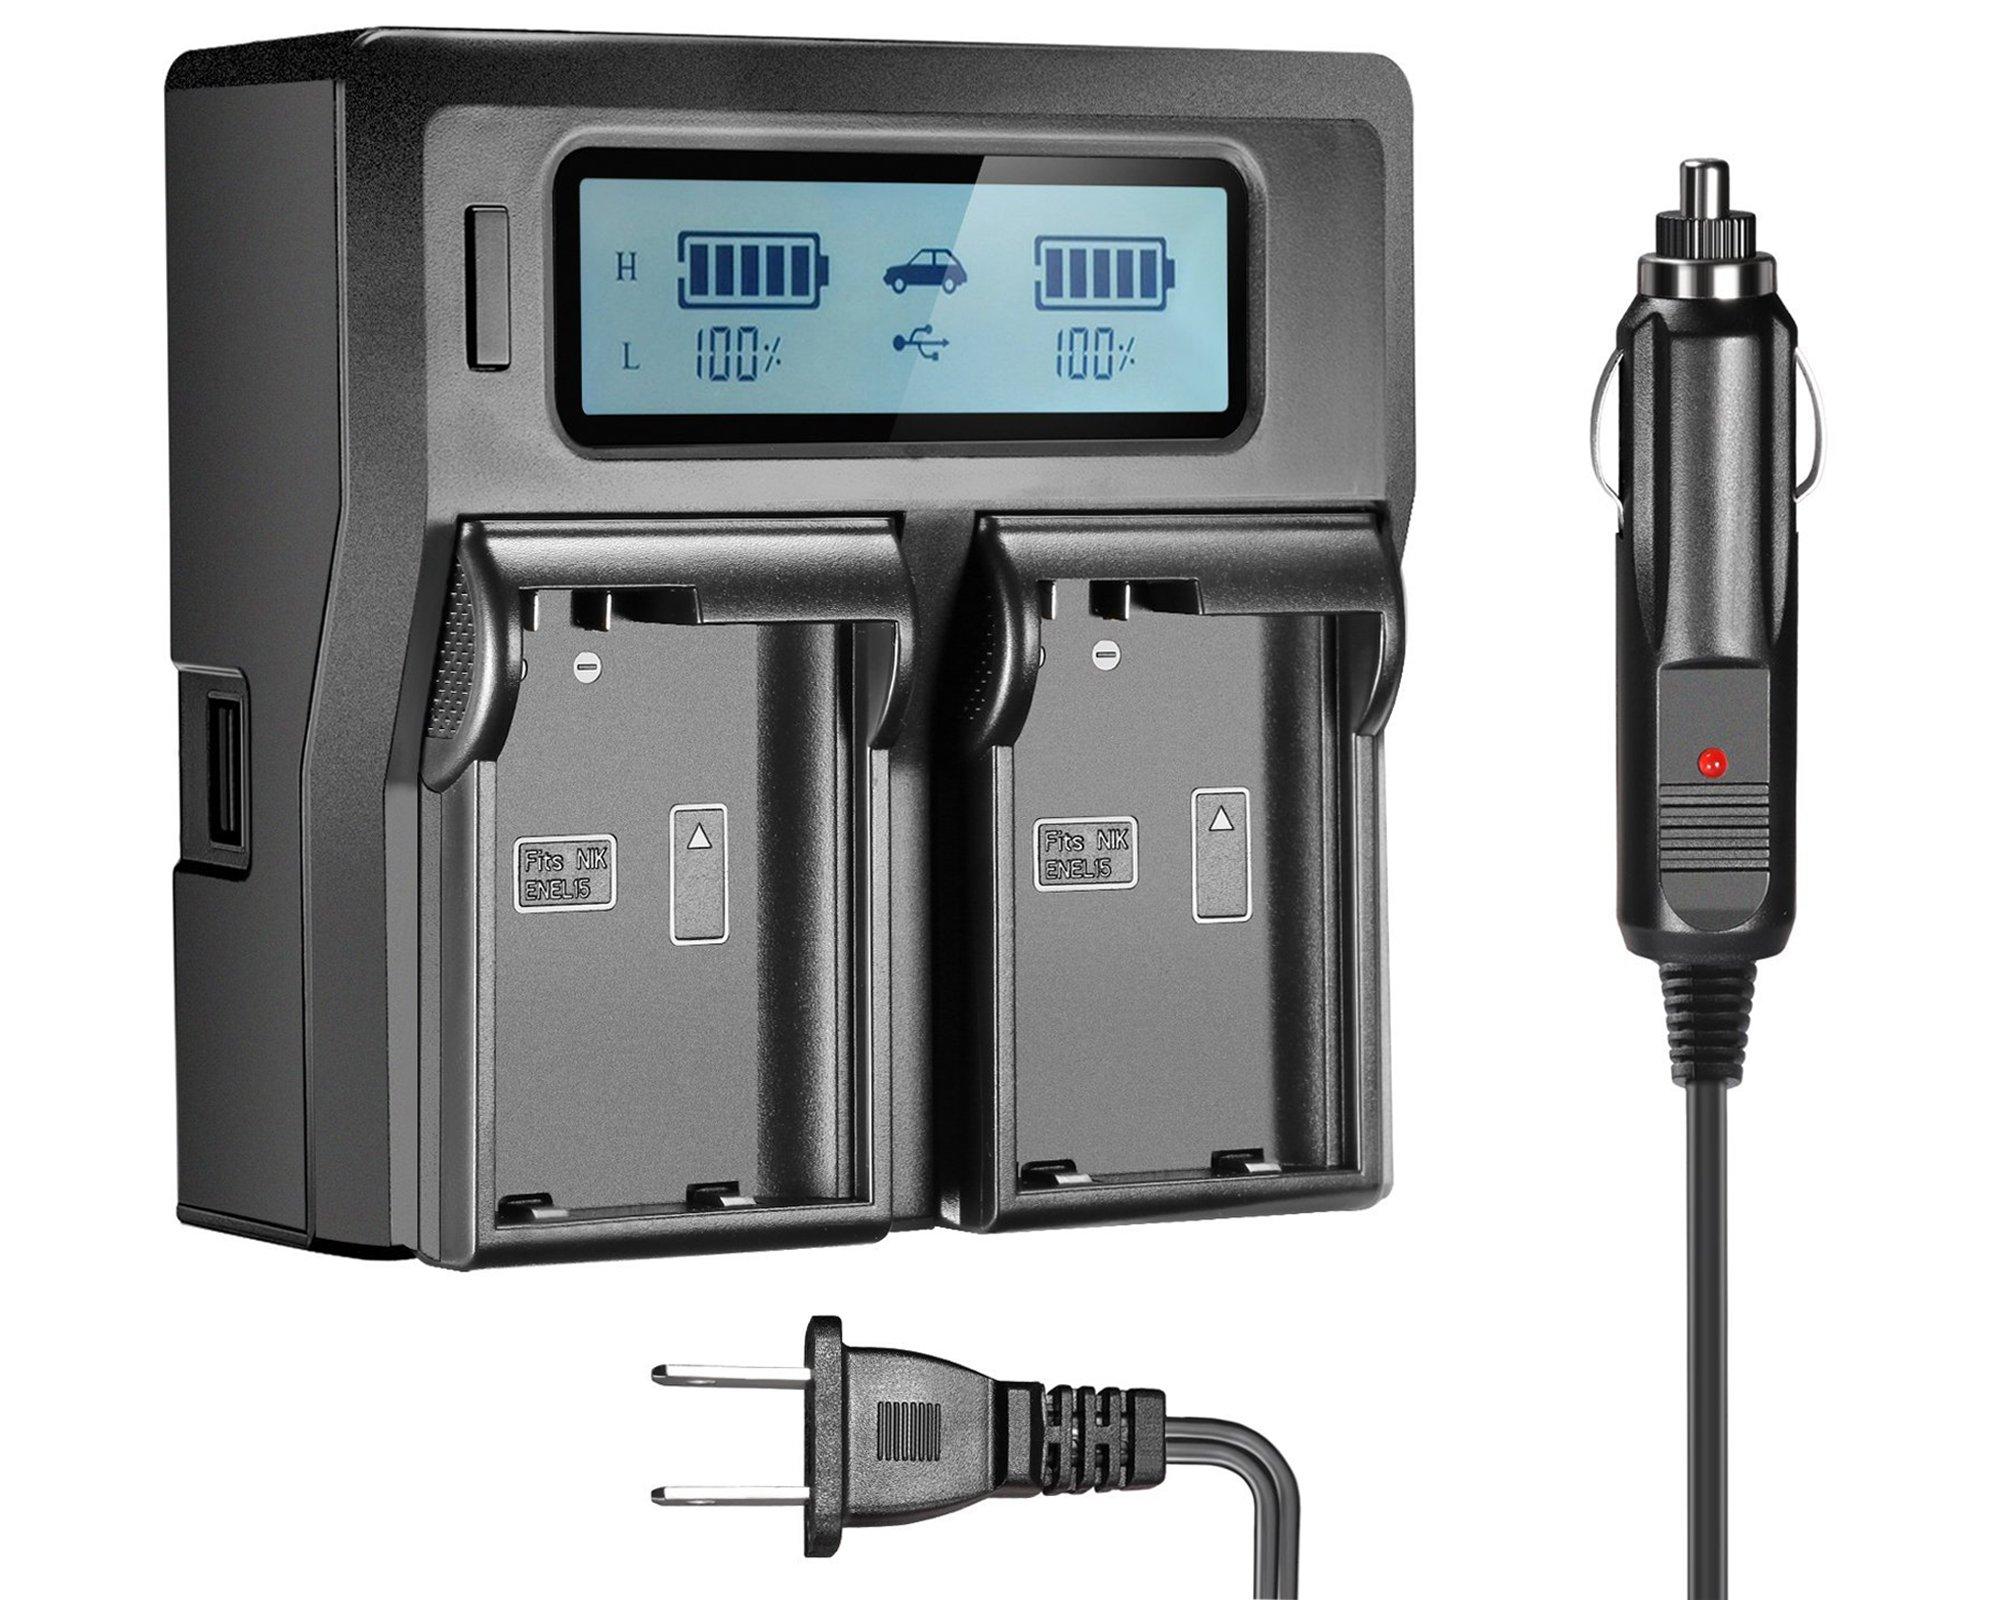 EN-EL15 EN-EL15A Dual LCD Battery Charger for Nikon DSLR D810, D750, D7200, D7100, D7000, D800E, D800, D610, D600, Nikon 1 V1 Digital Cameras ... by SR SUN ROOM